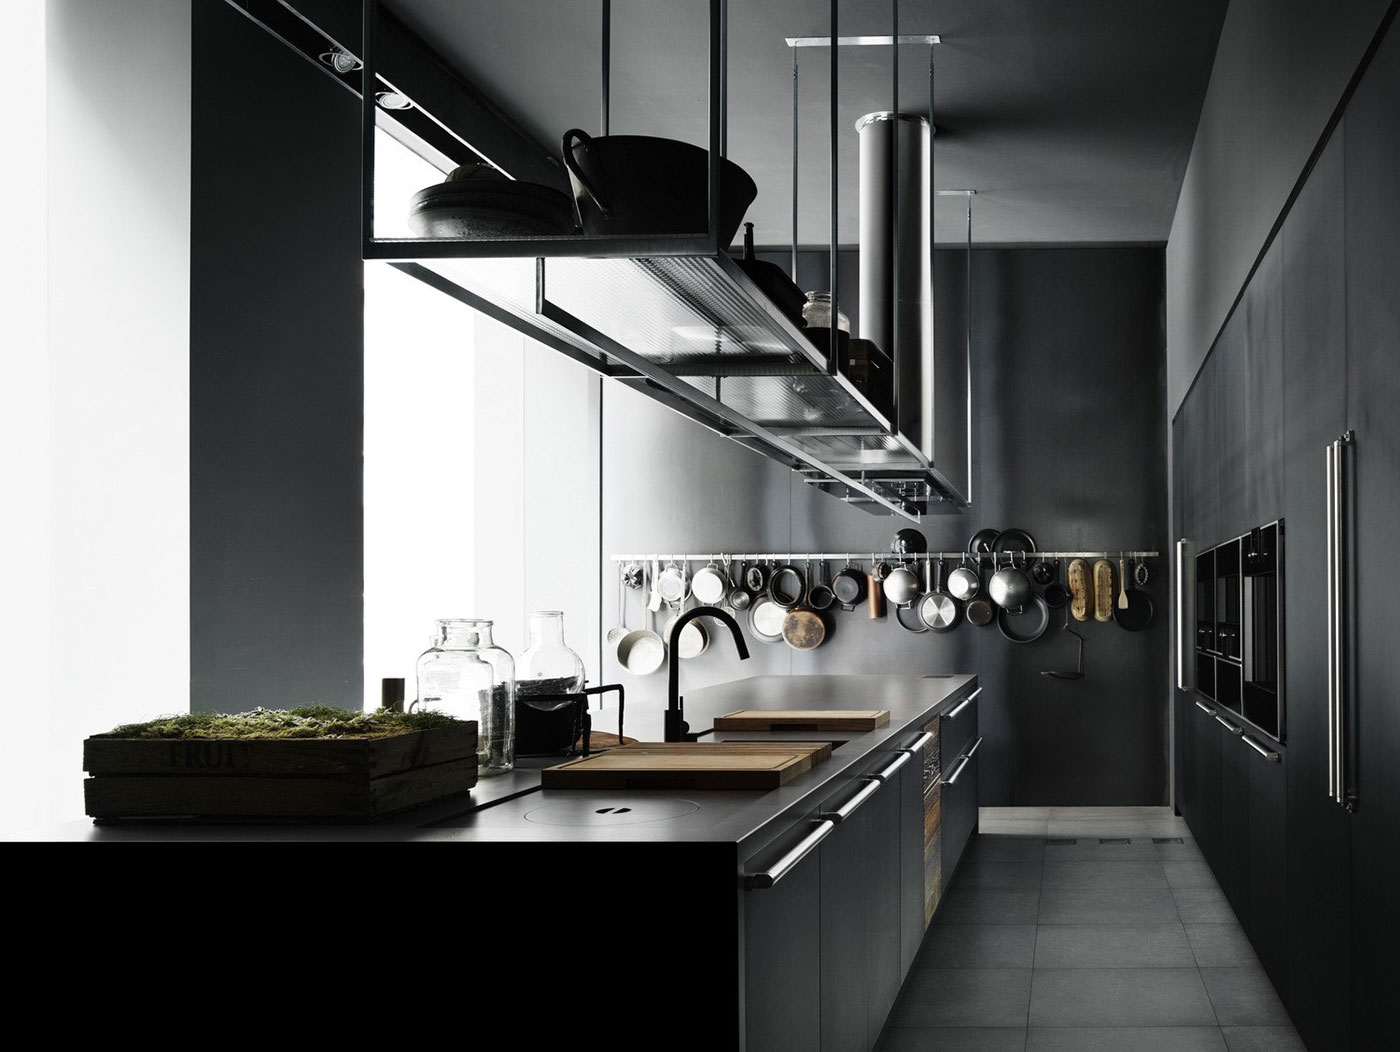 Obegi Home Boffi Code Kitchen Boffi 254532 rel18c8837c